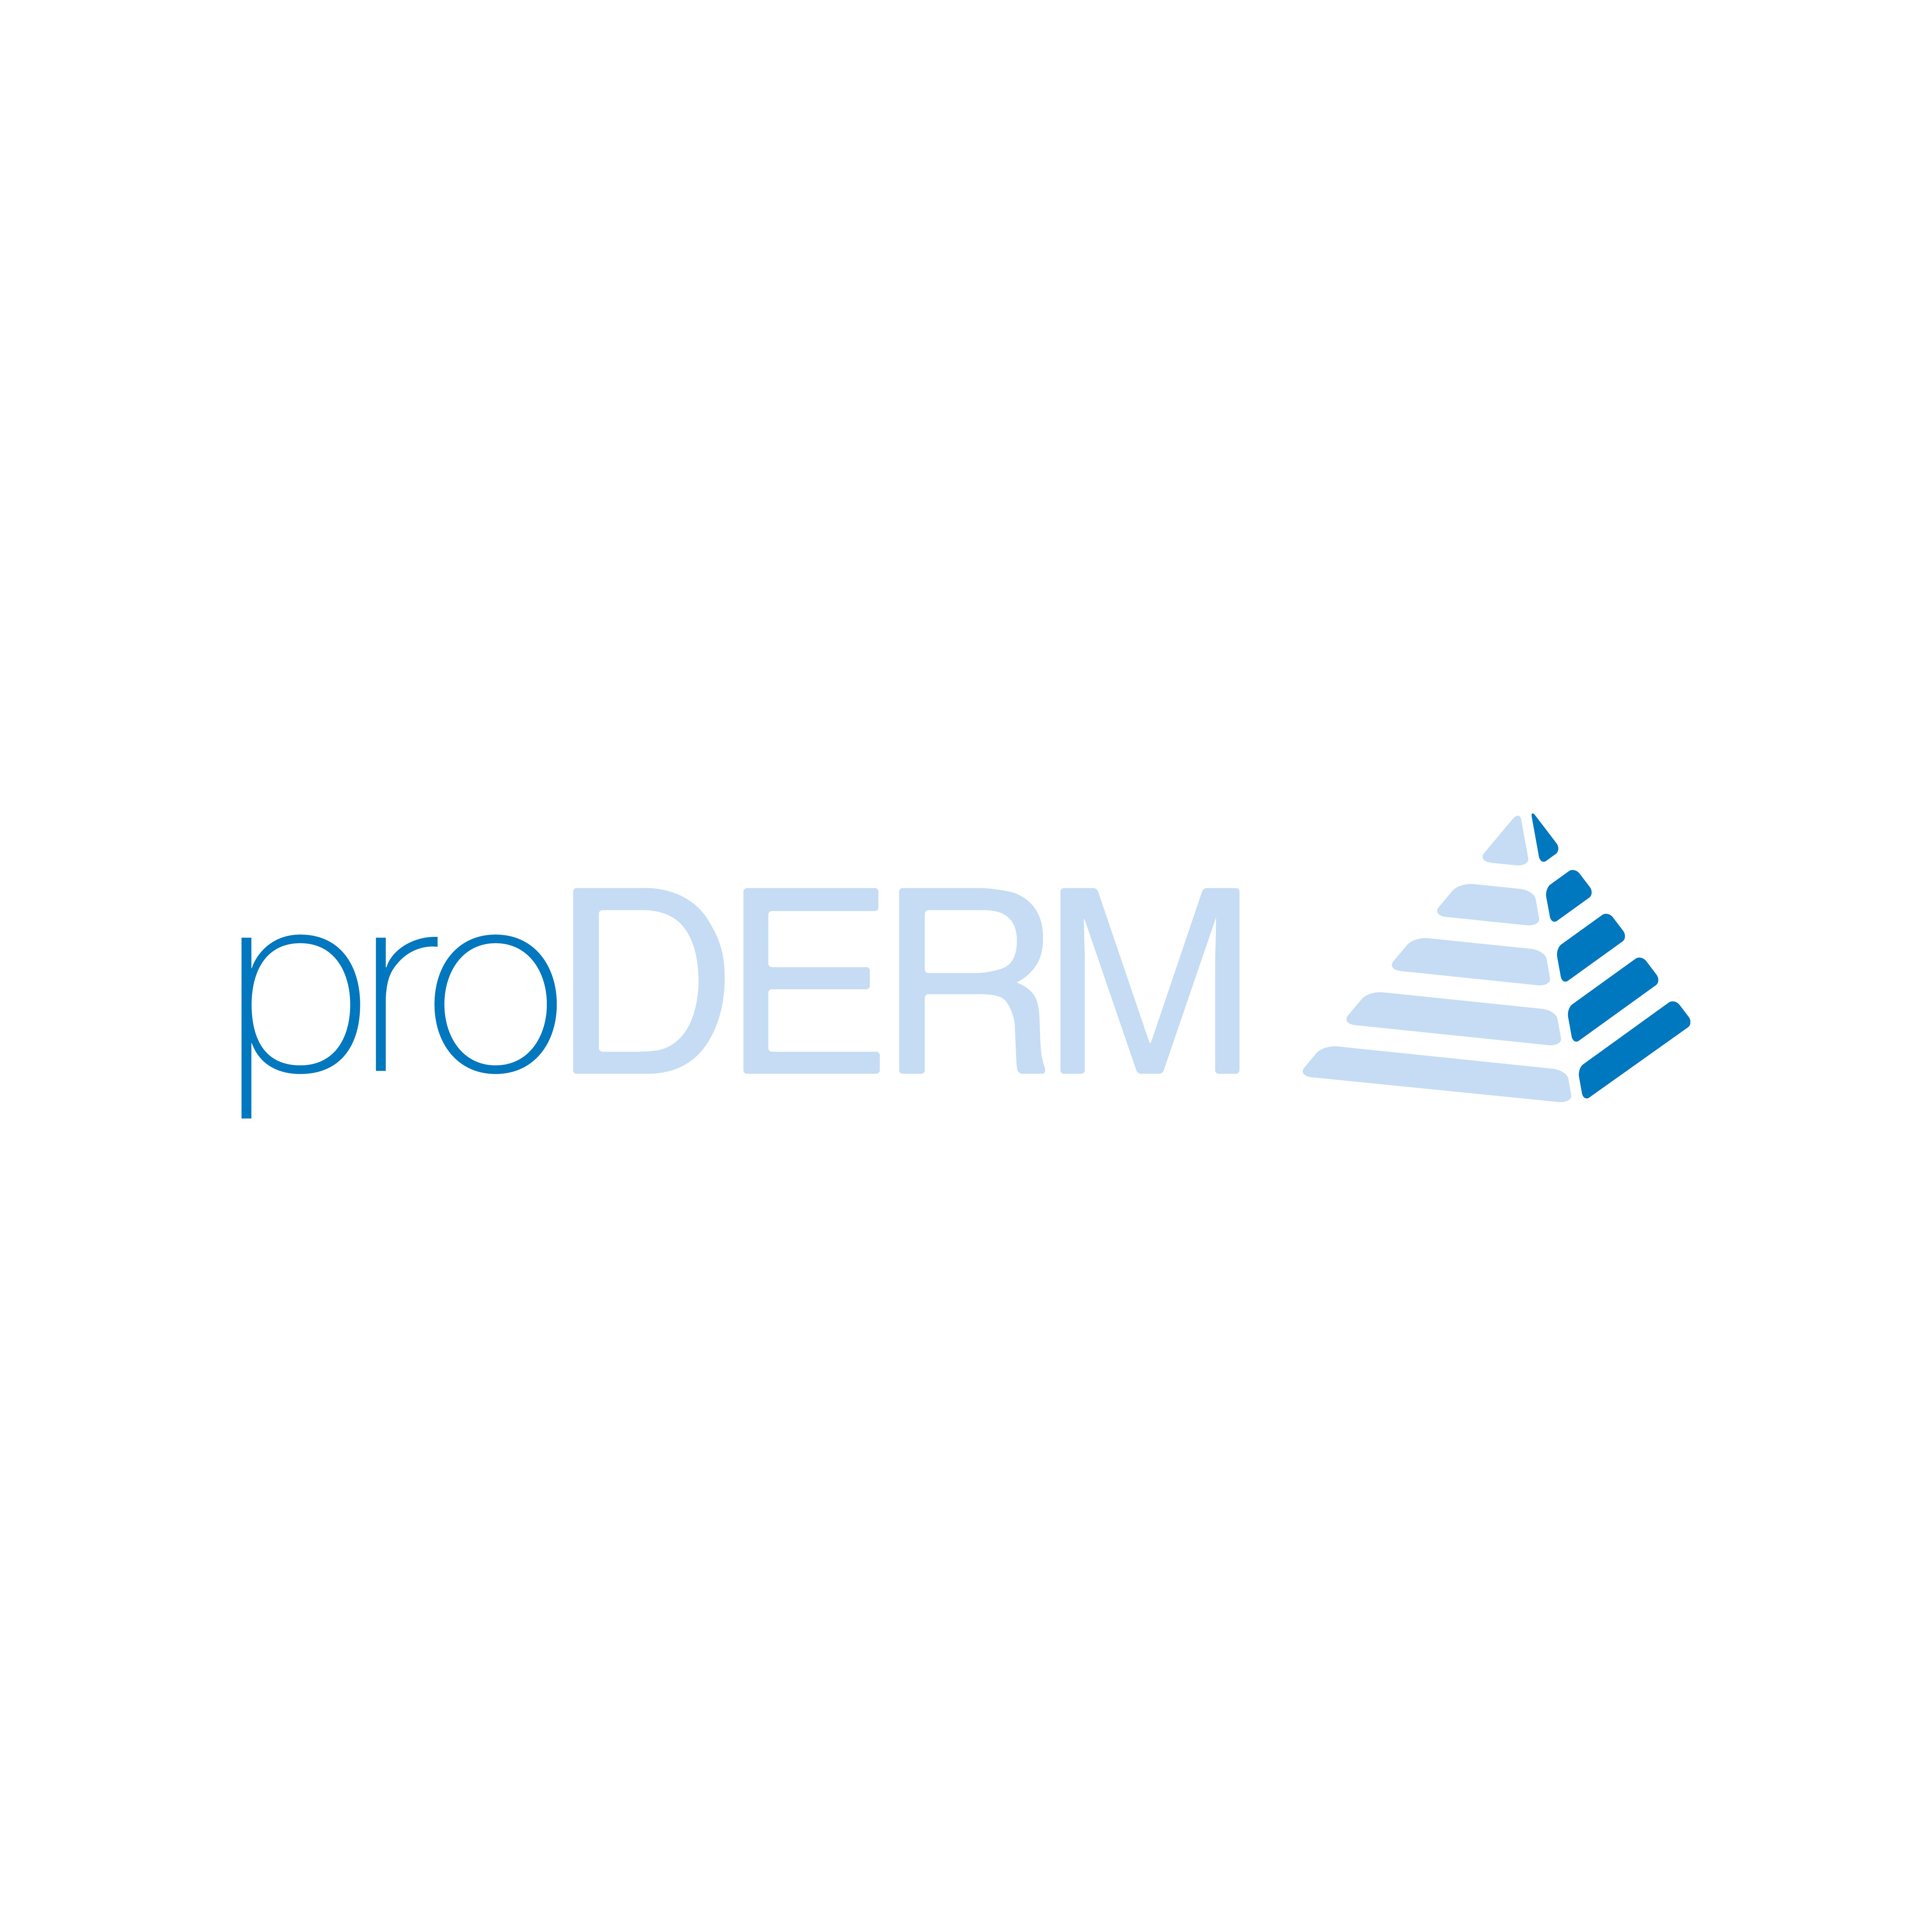 proderm300x150px